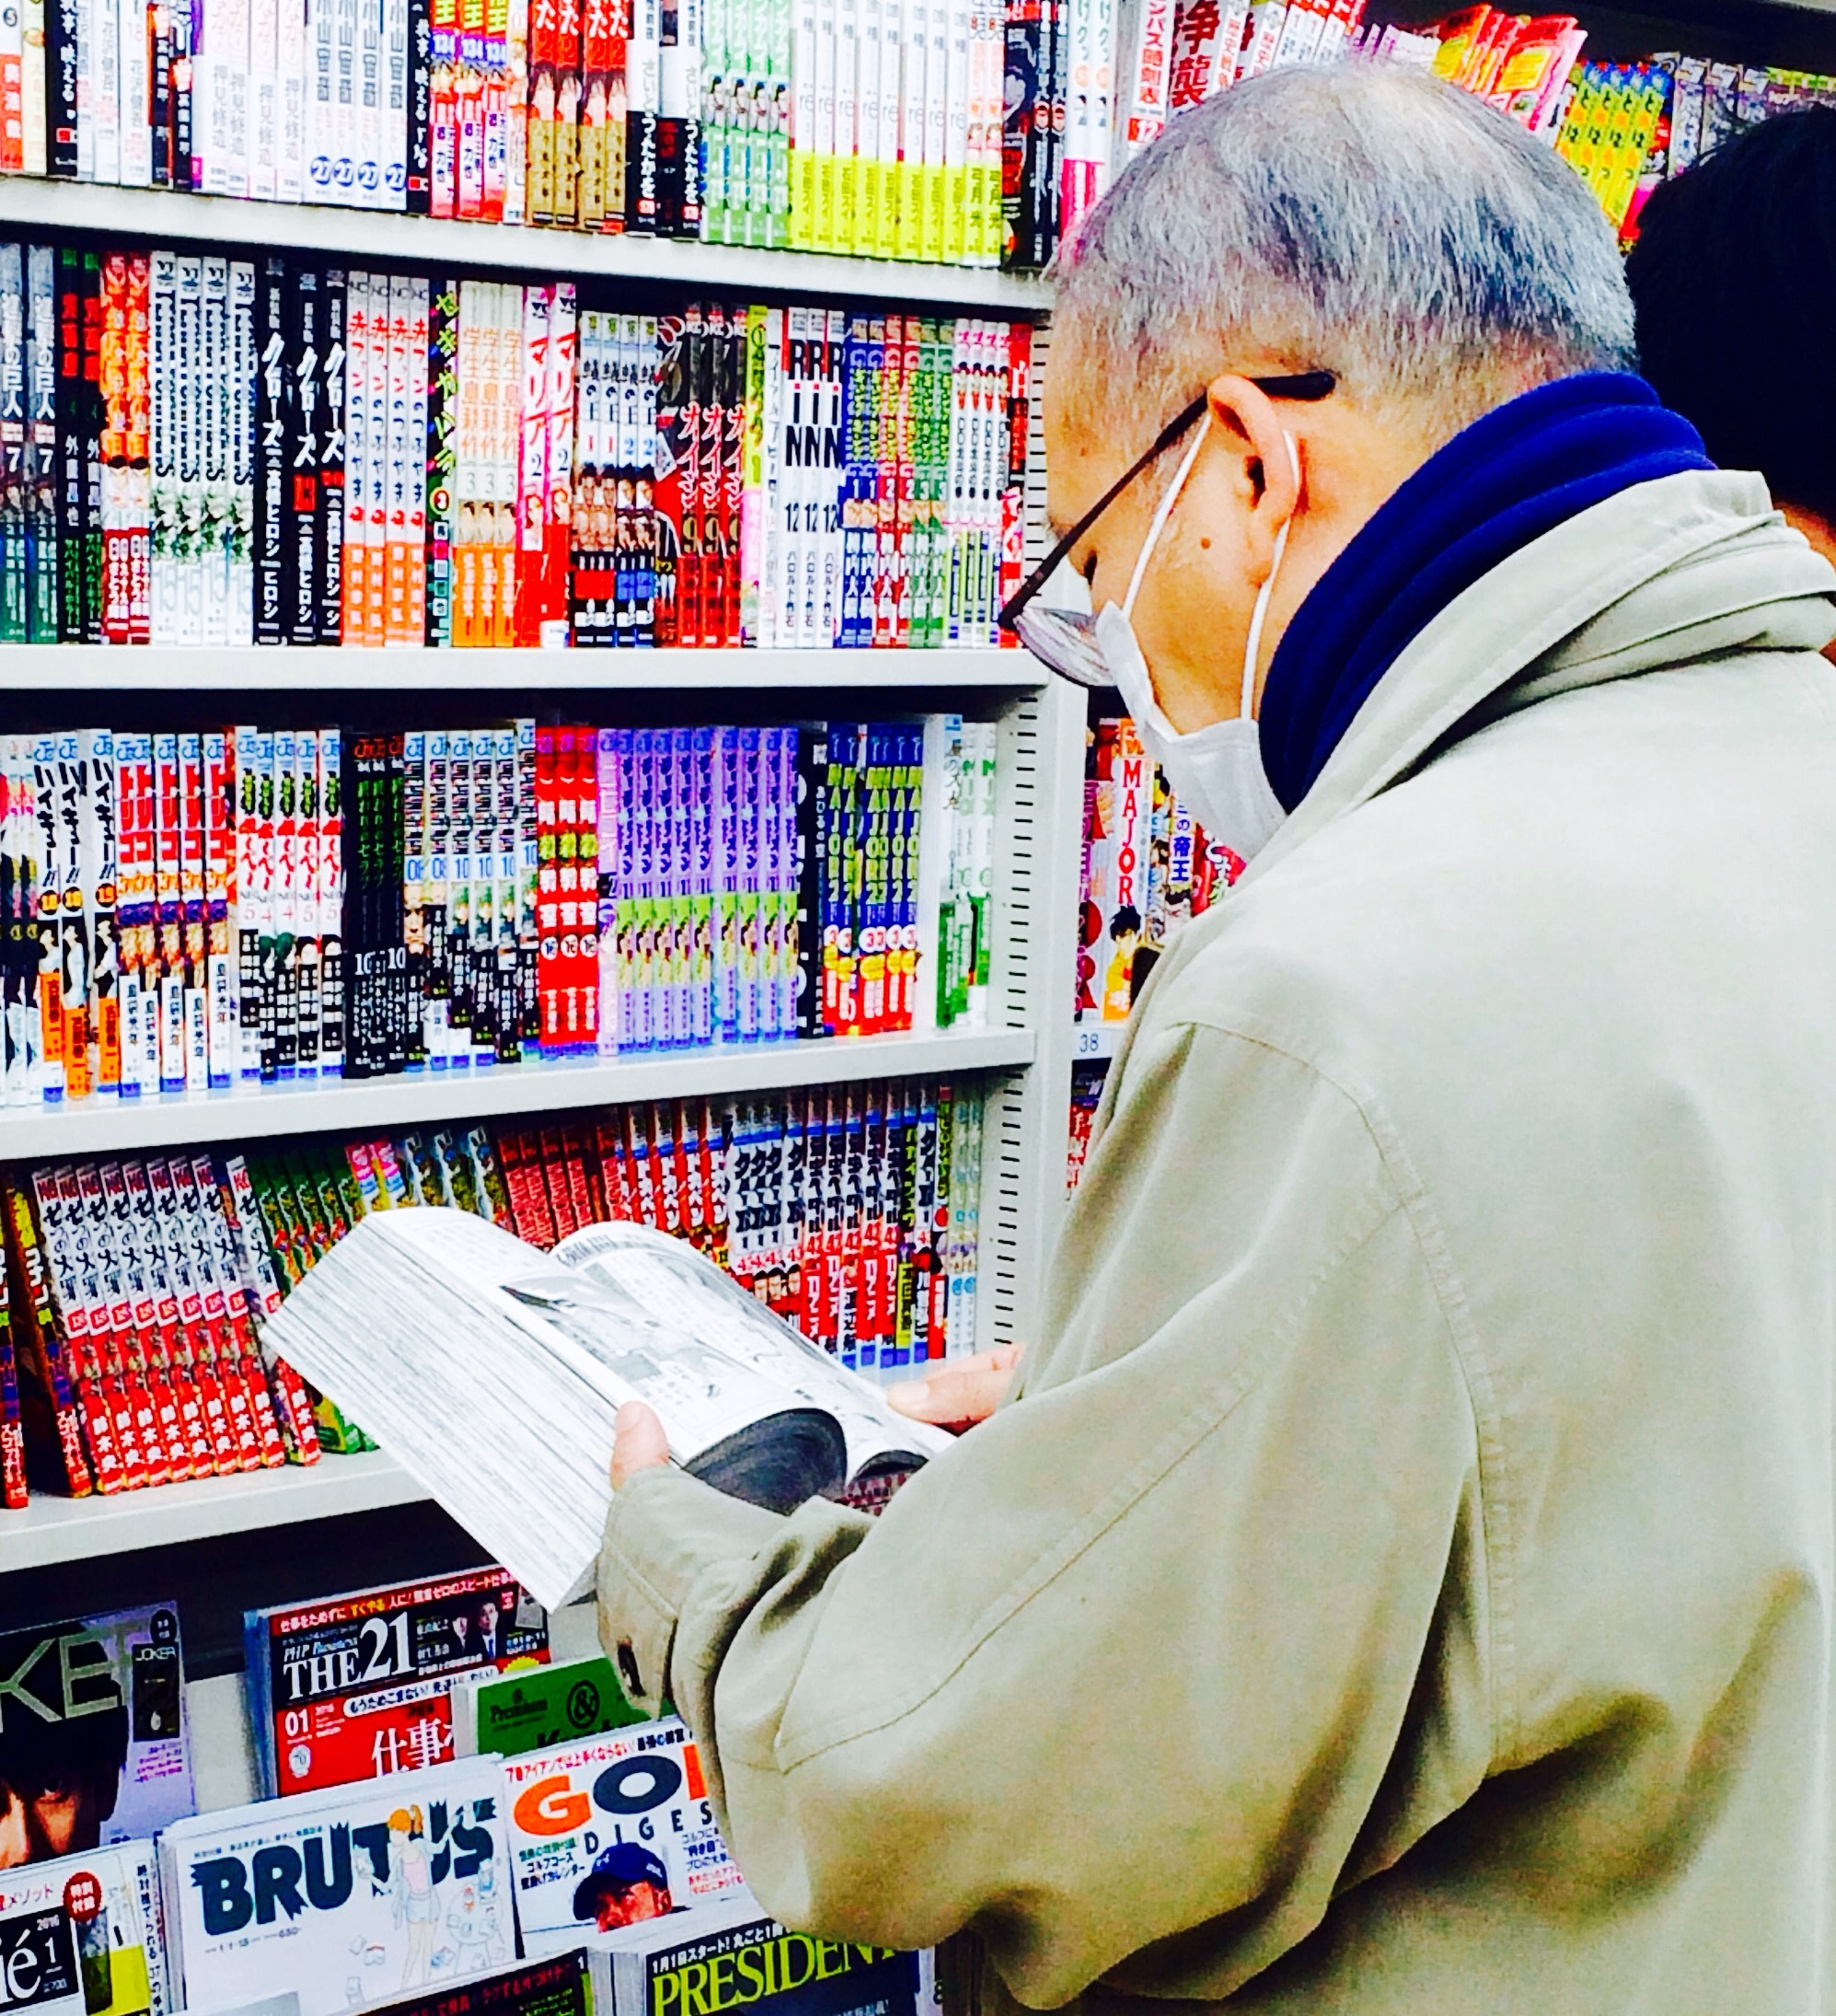 Even grandpa reads manga